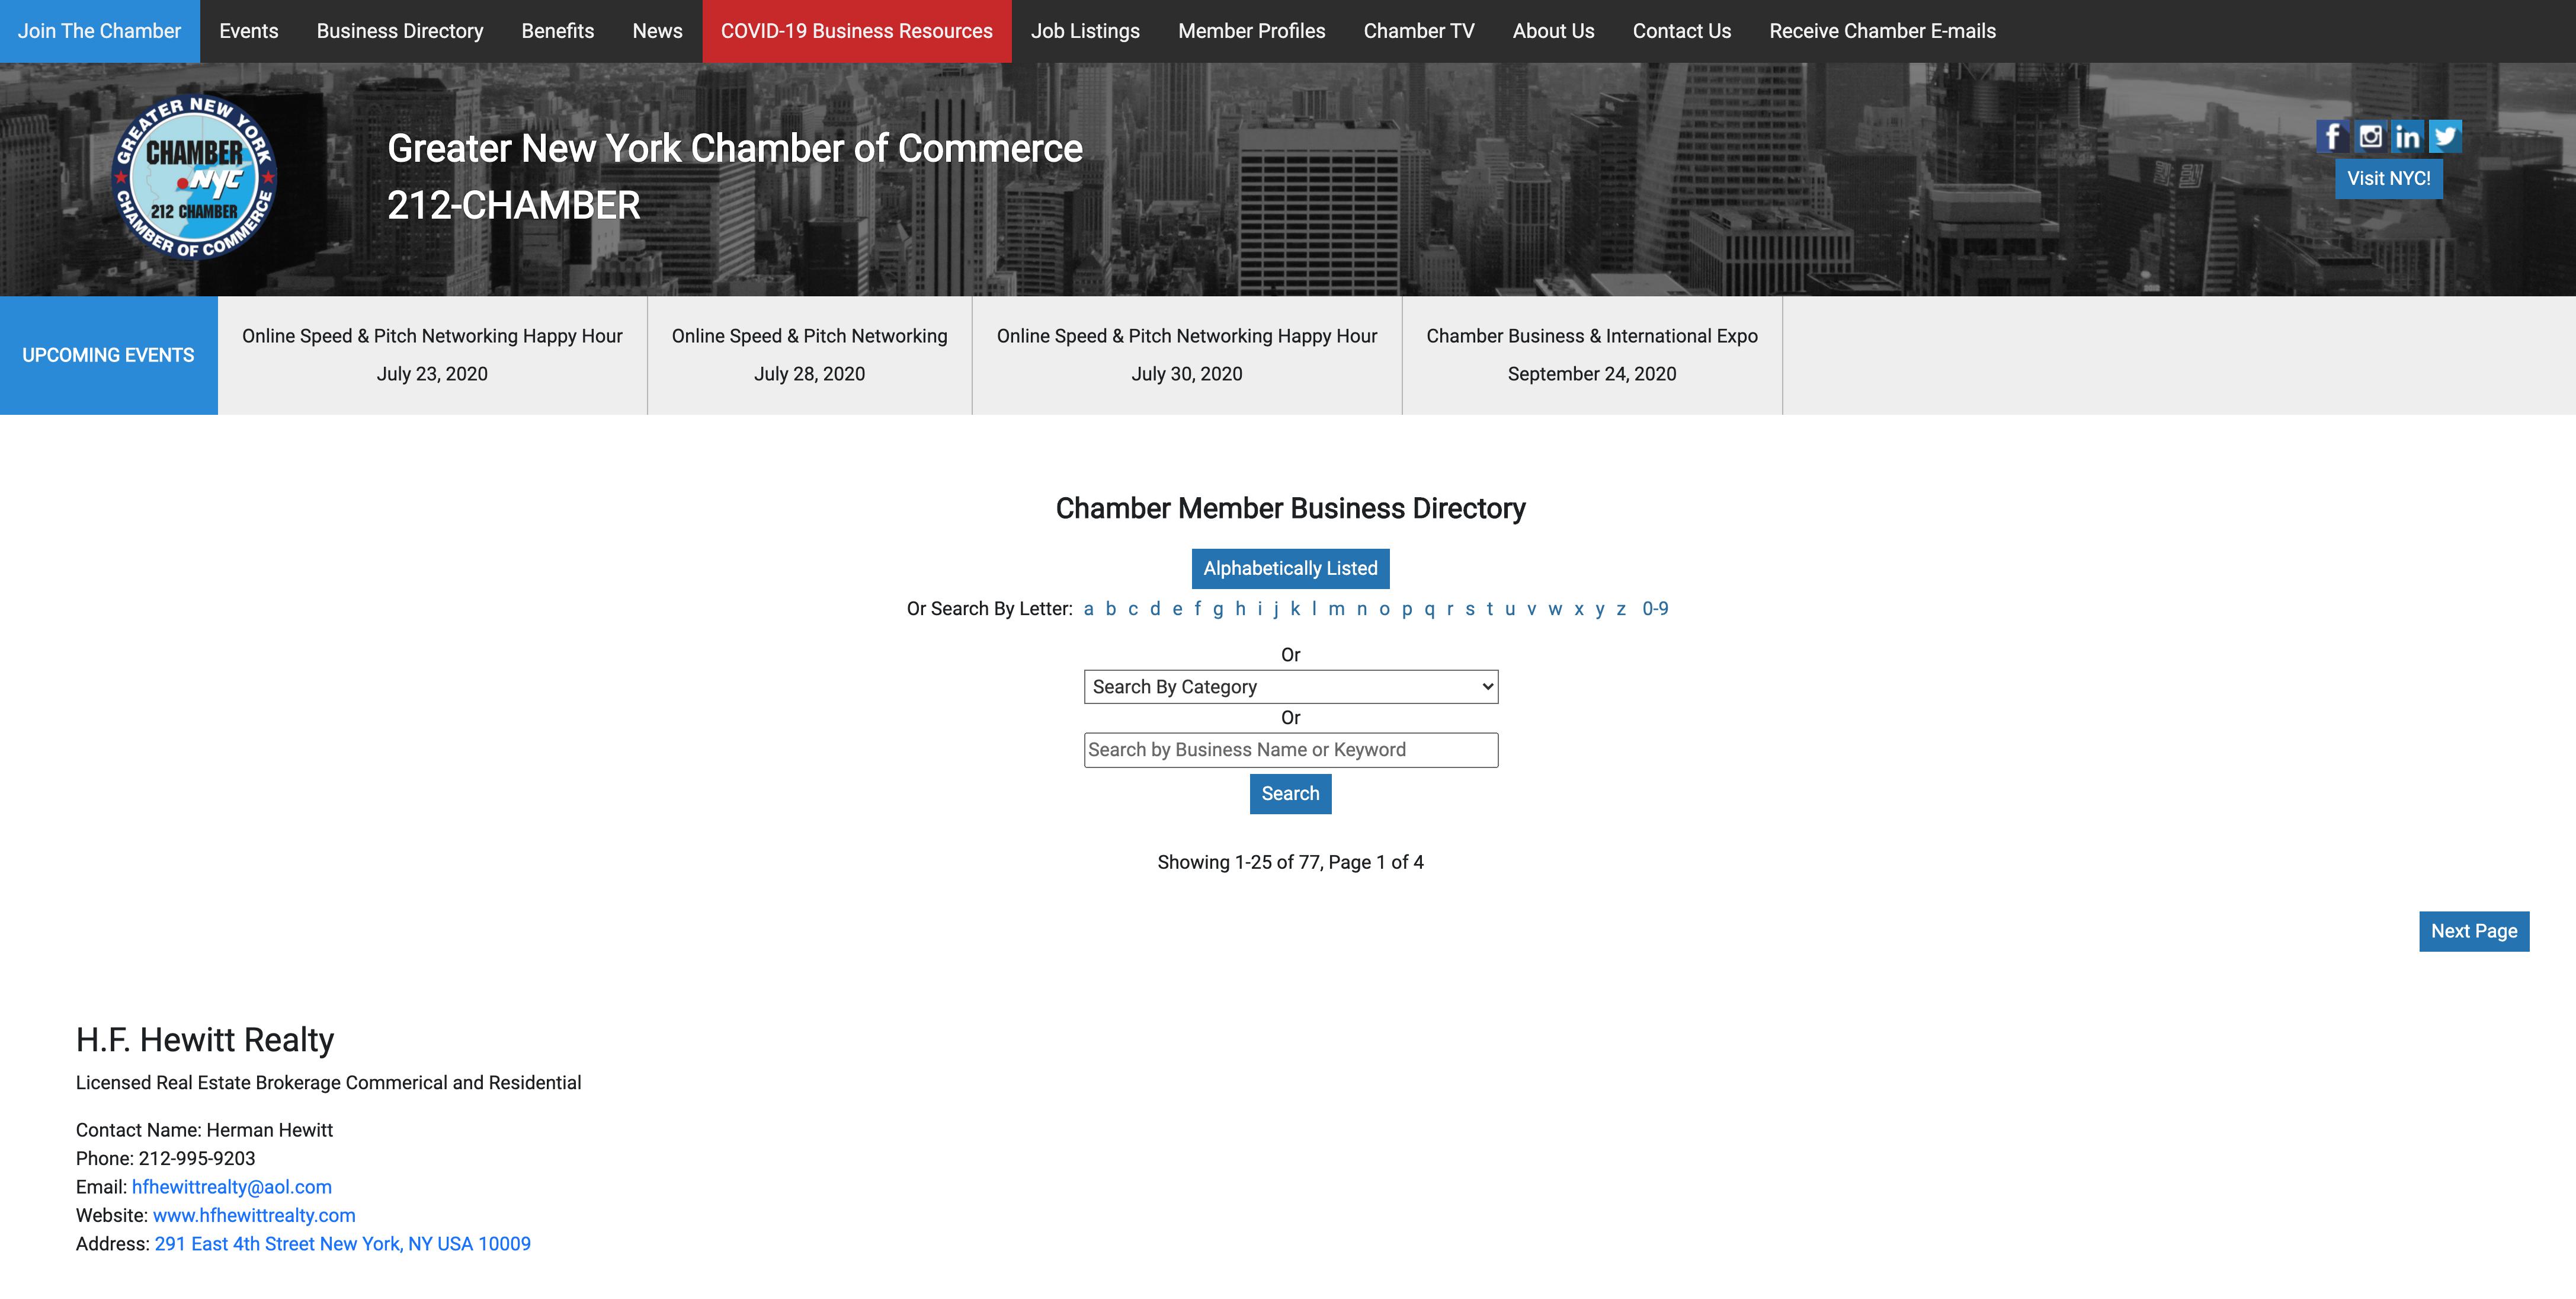 NY Chamber of Commerce screenshot